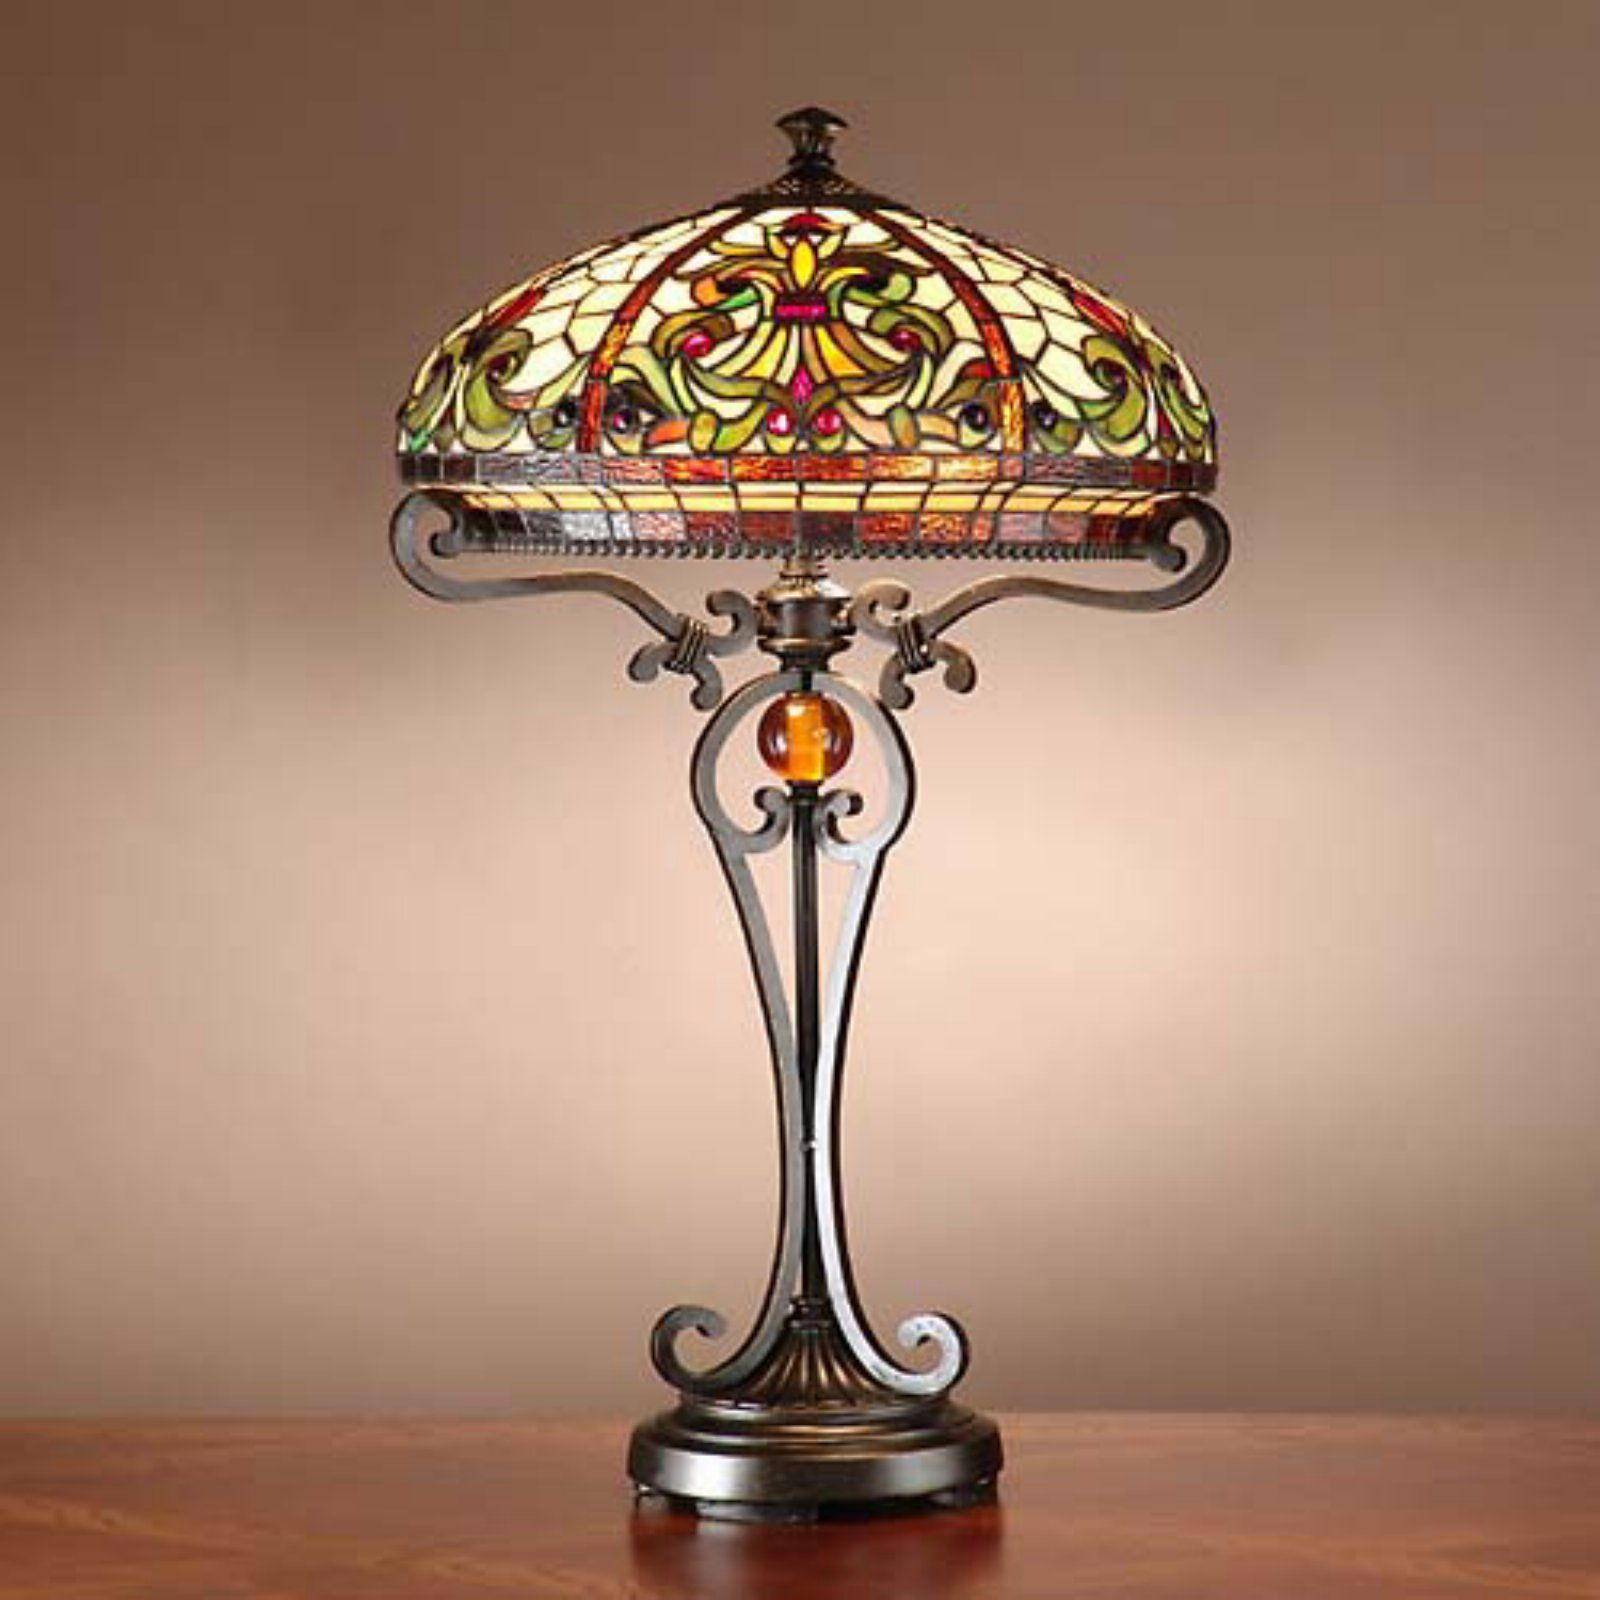 Dale Tiffany Tt101114 Boehme Tiffany Table Lamp Vidrieras Tiffany Lamparas Art Deco Lamparas De Tiffany